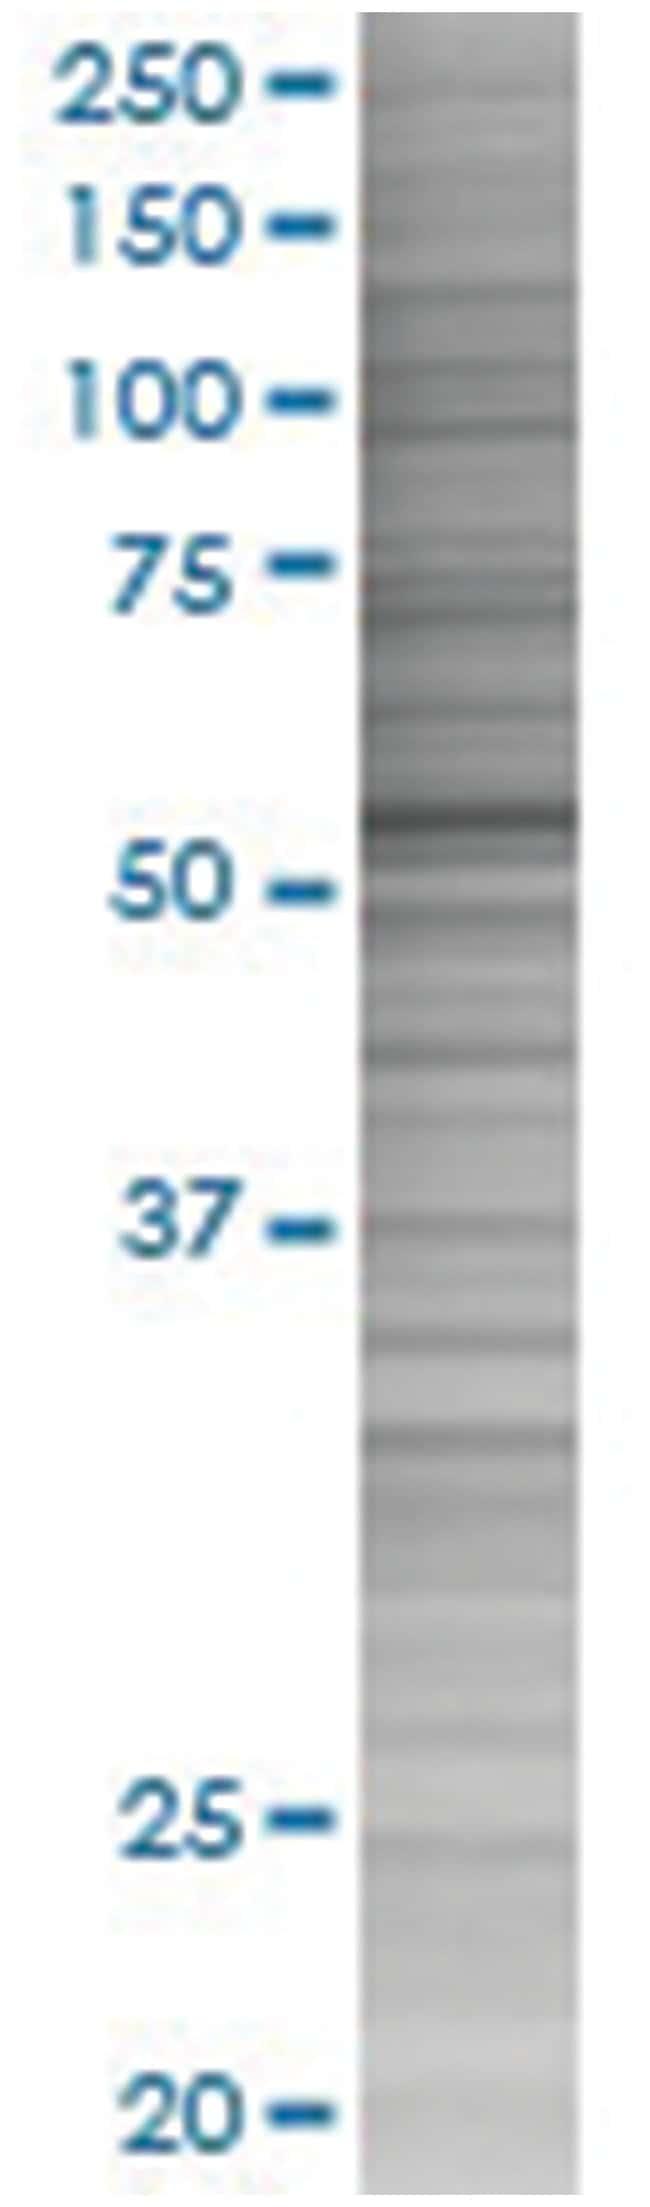 CYP1A2 293T Cell Overexpression Lysate (Denatured), Abnova 100µL:Life